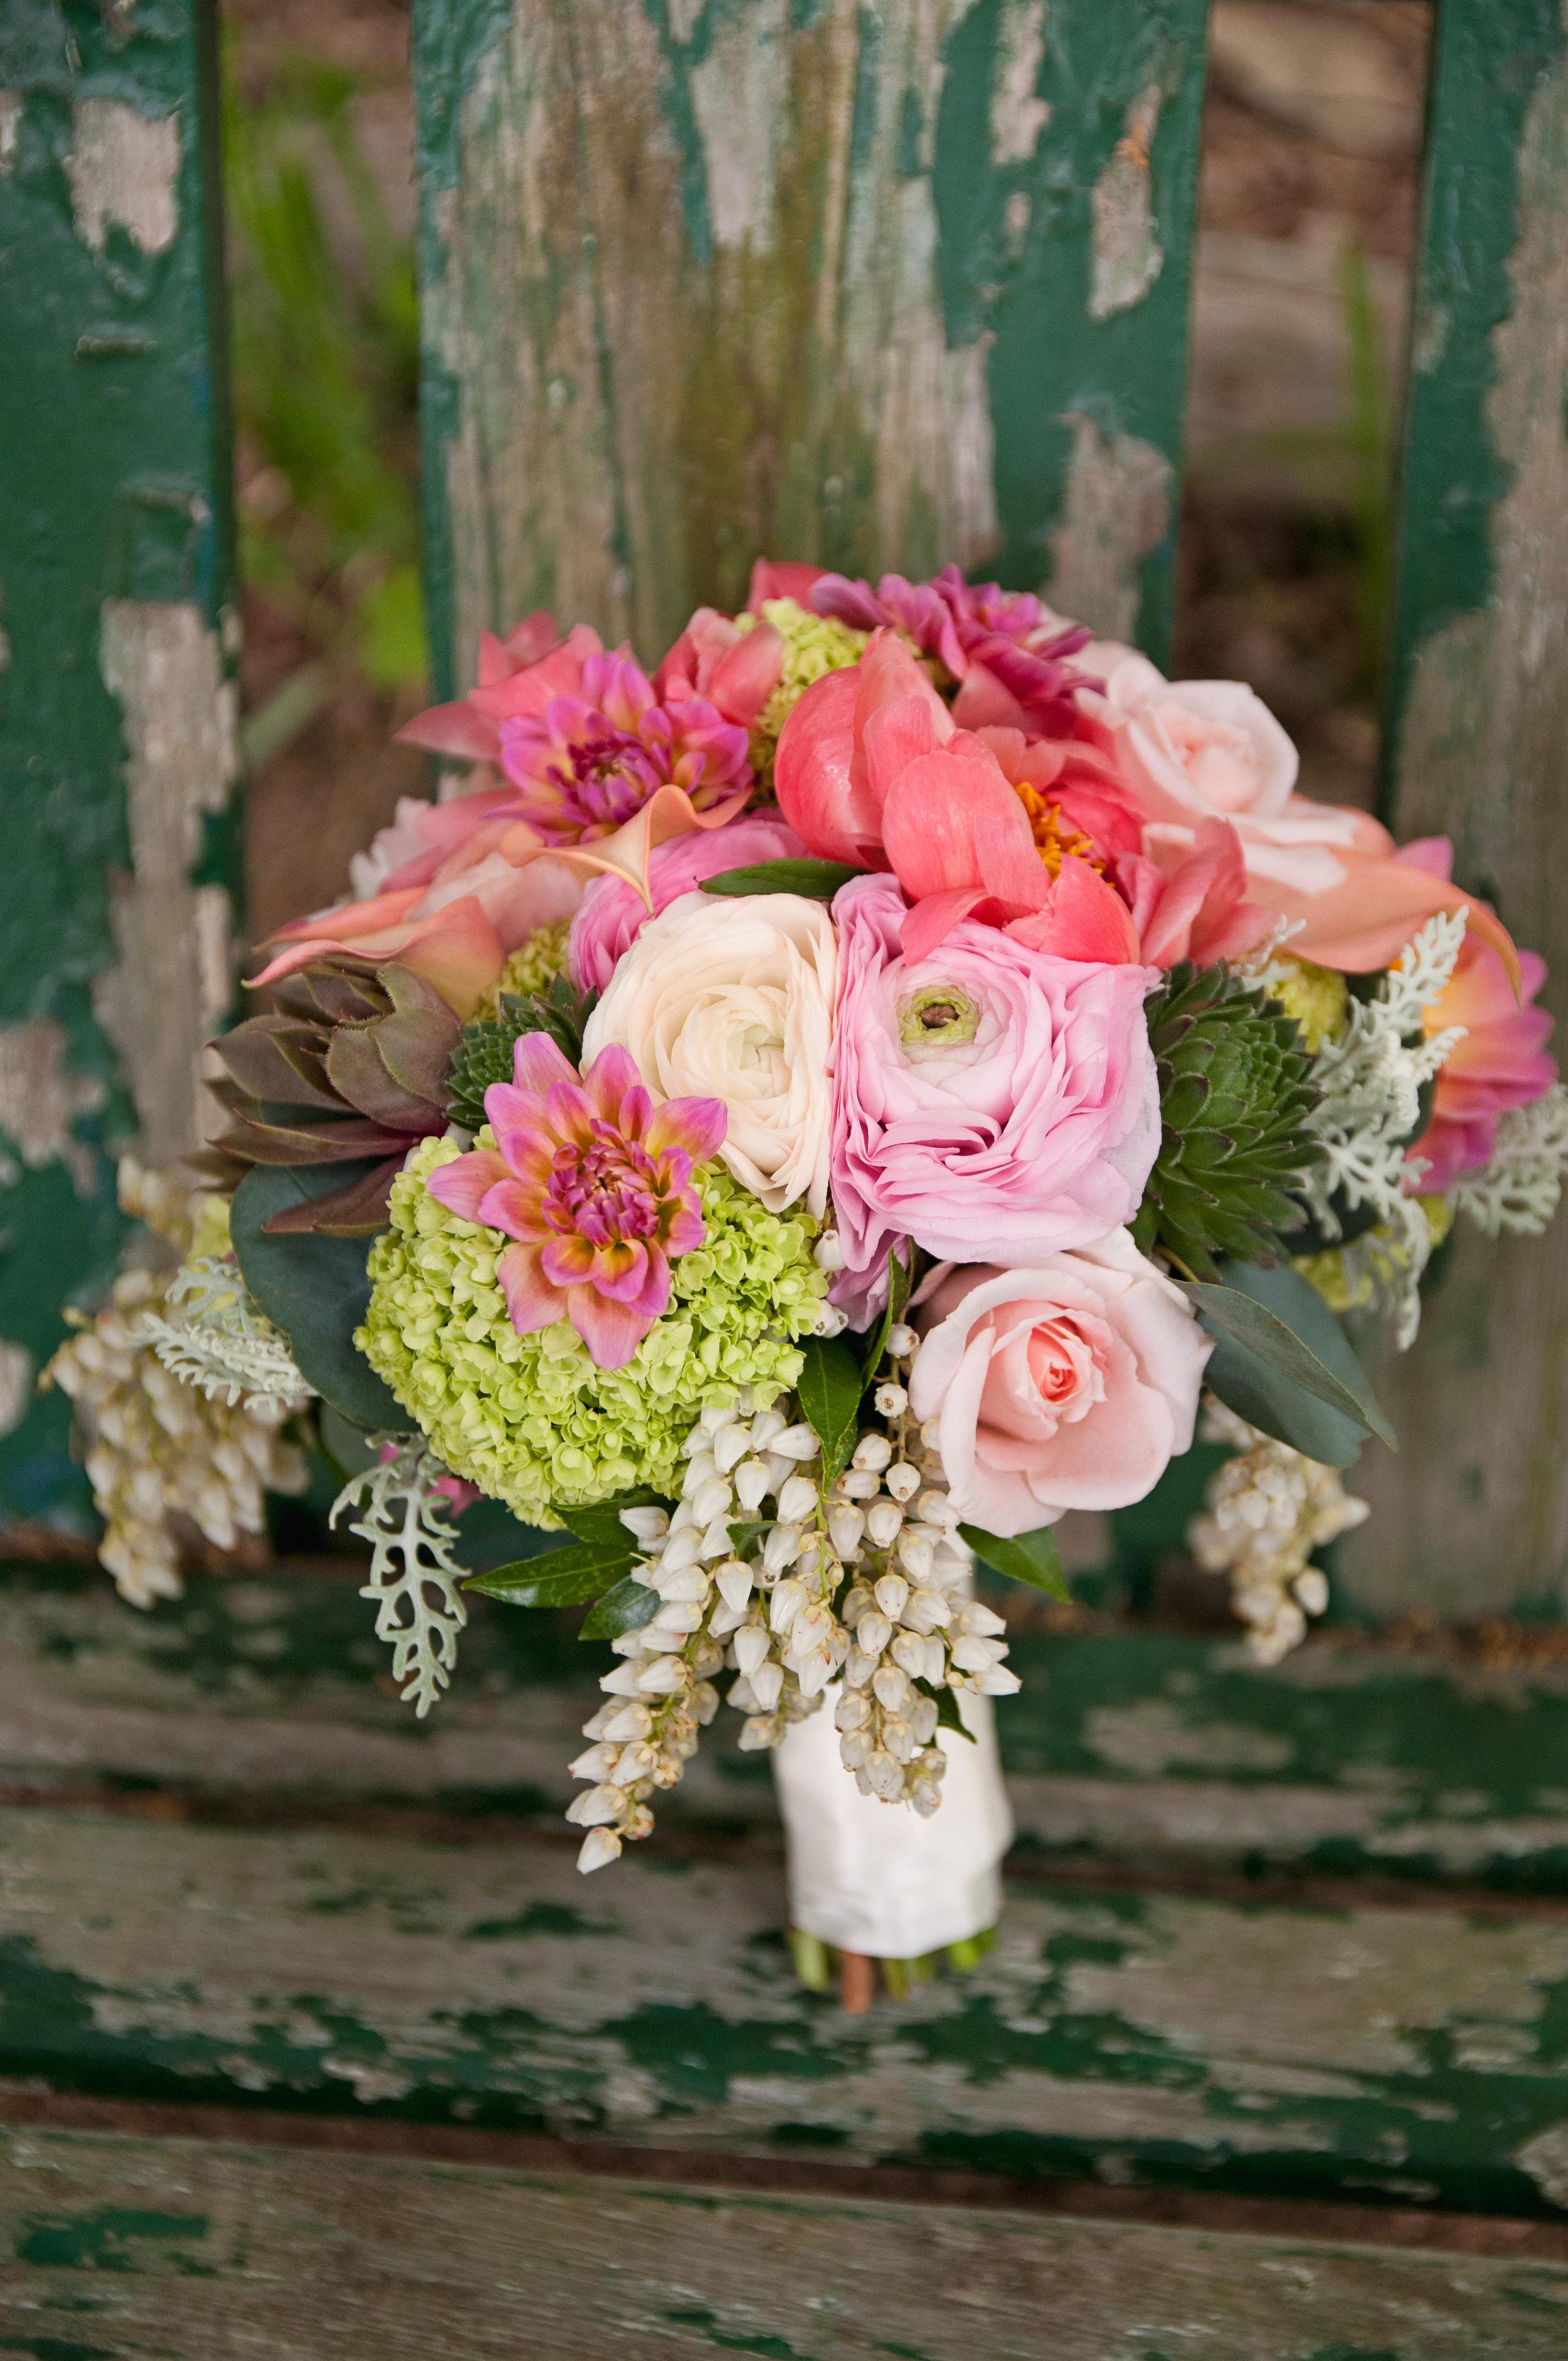 Angela_Chicoski_CT_wedding_photographer_055.jpg